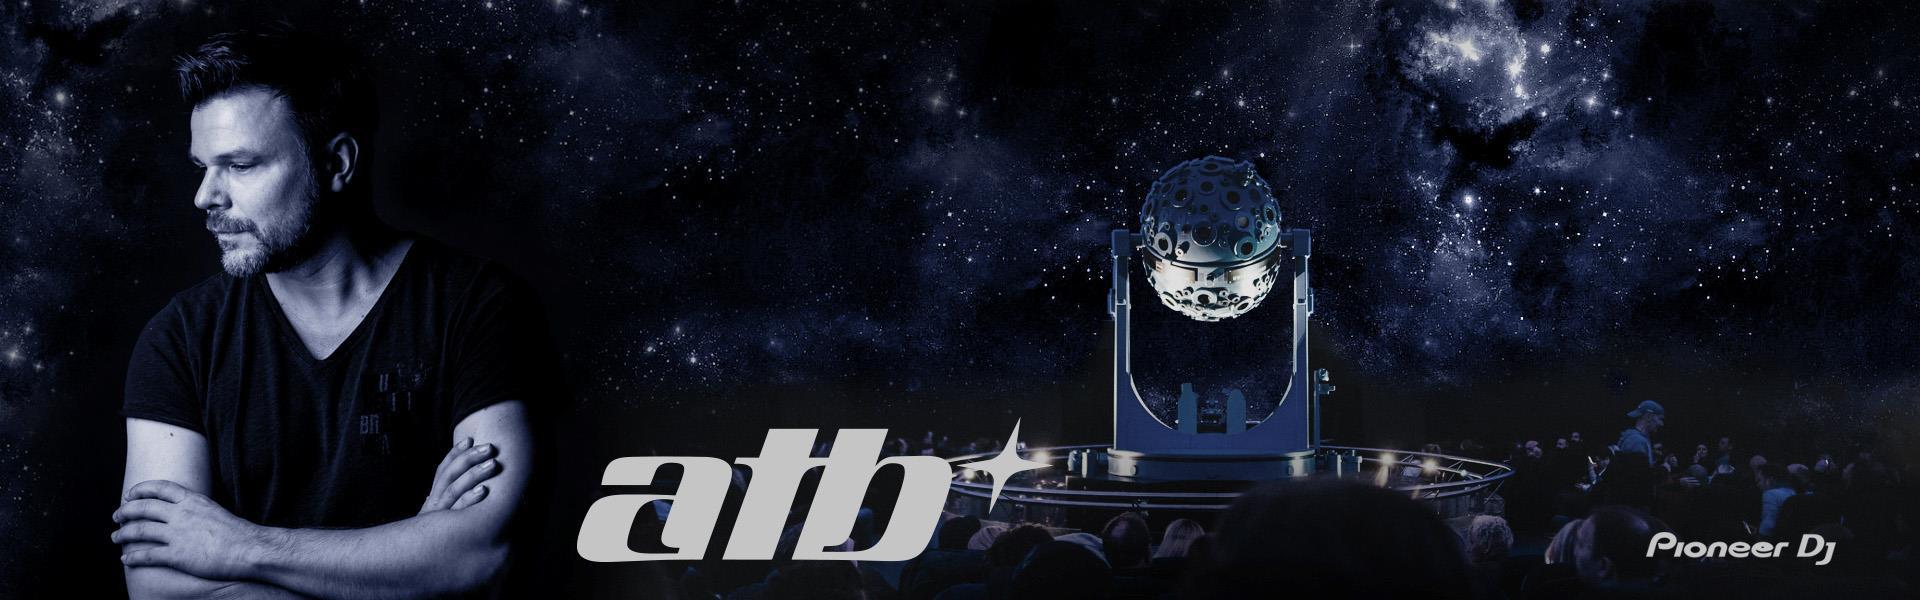 ATB under the stars